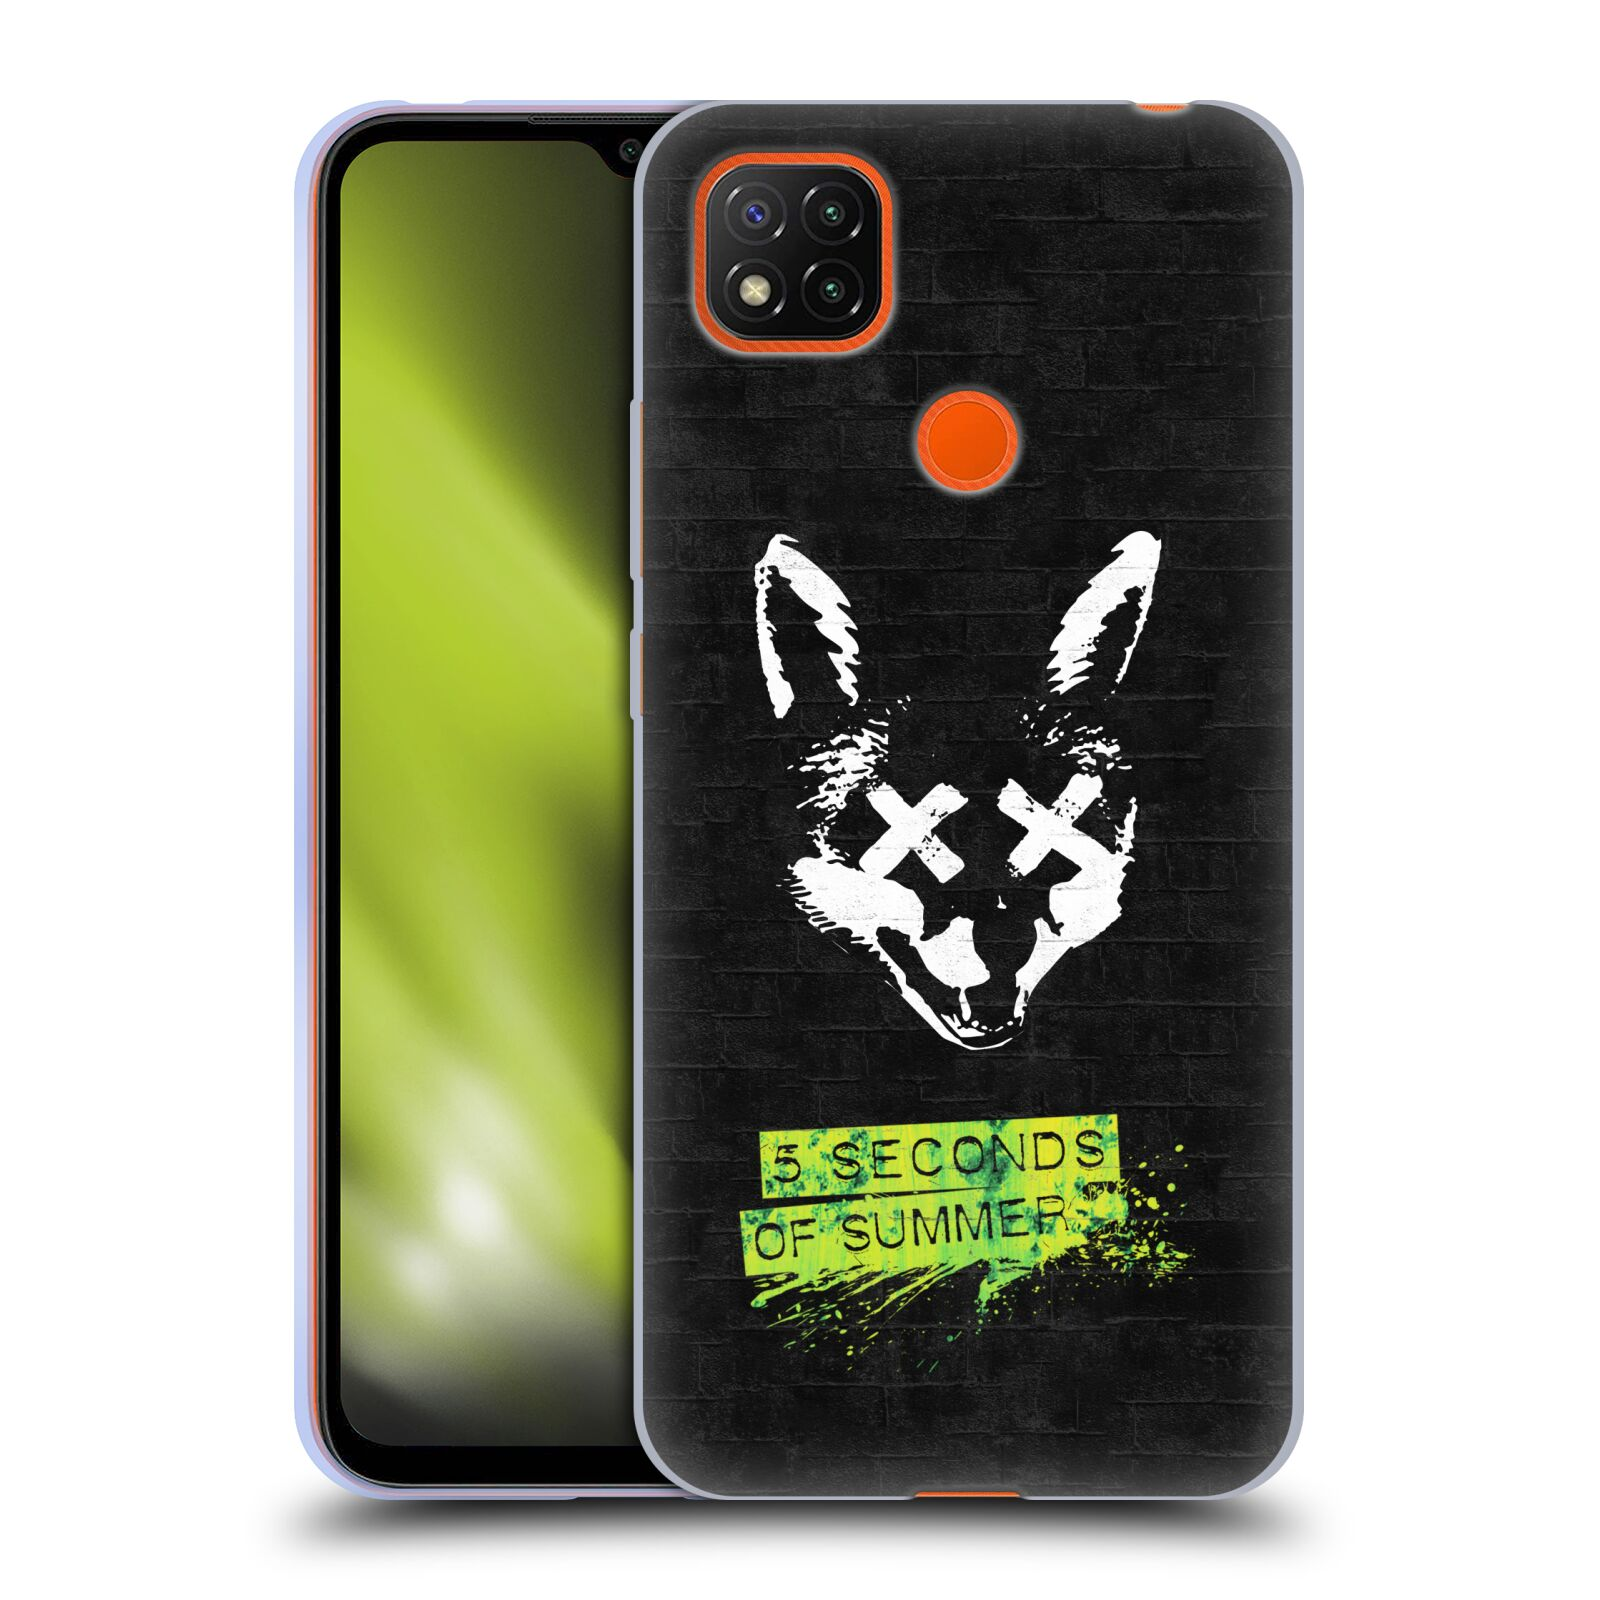 Silikonové pouzdro na mobil Xiaomi Redmi 9C - Head Case - 5 Seconds of Summer - Fox